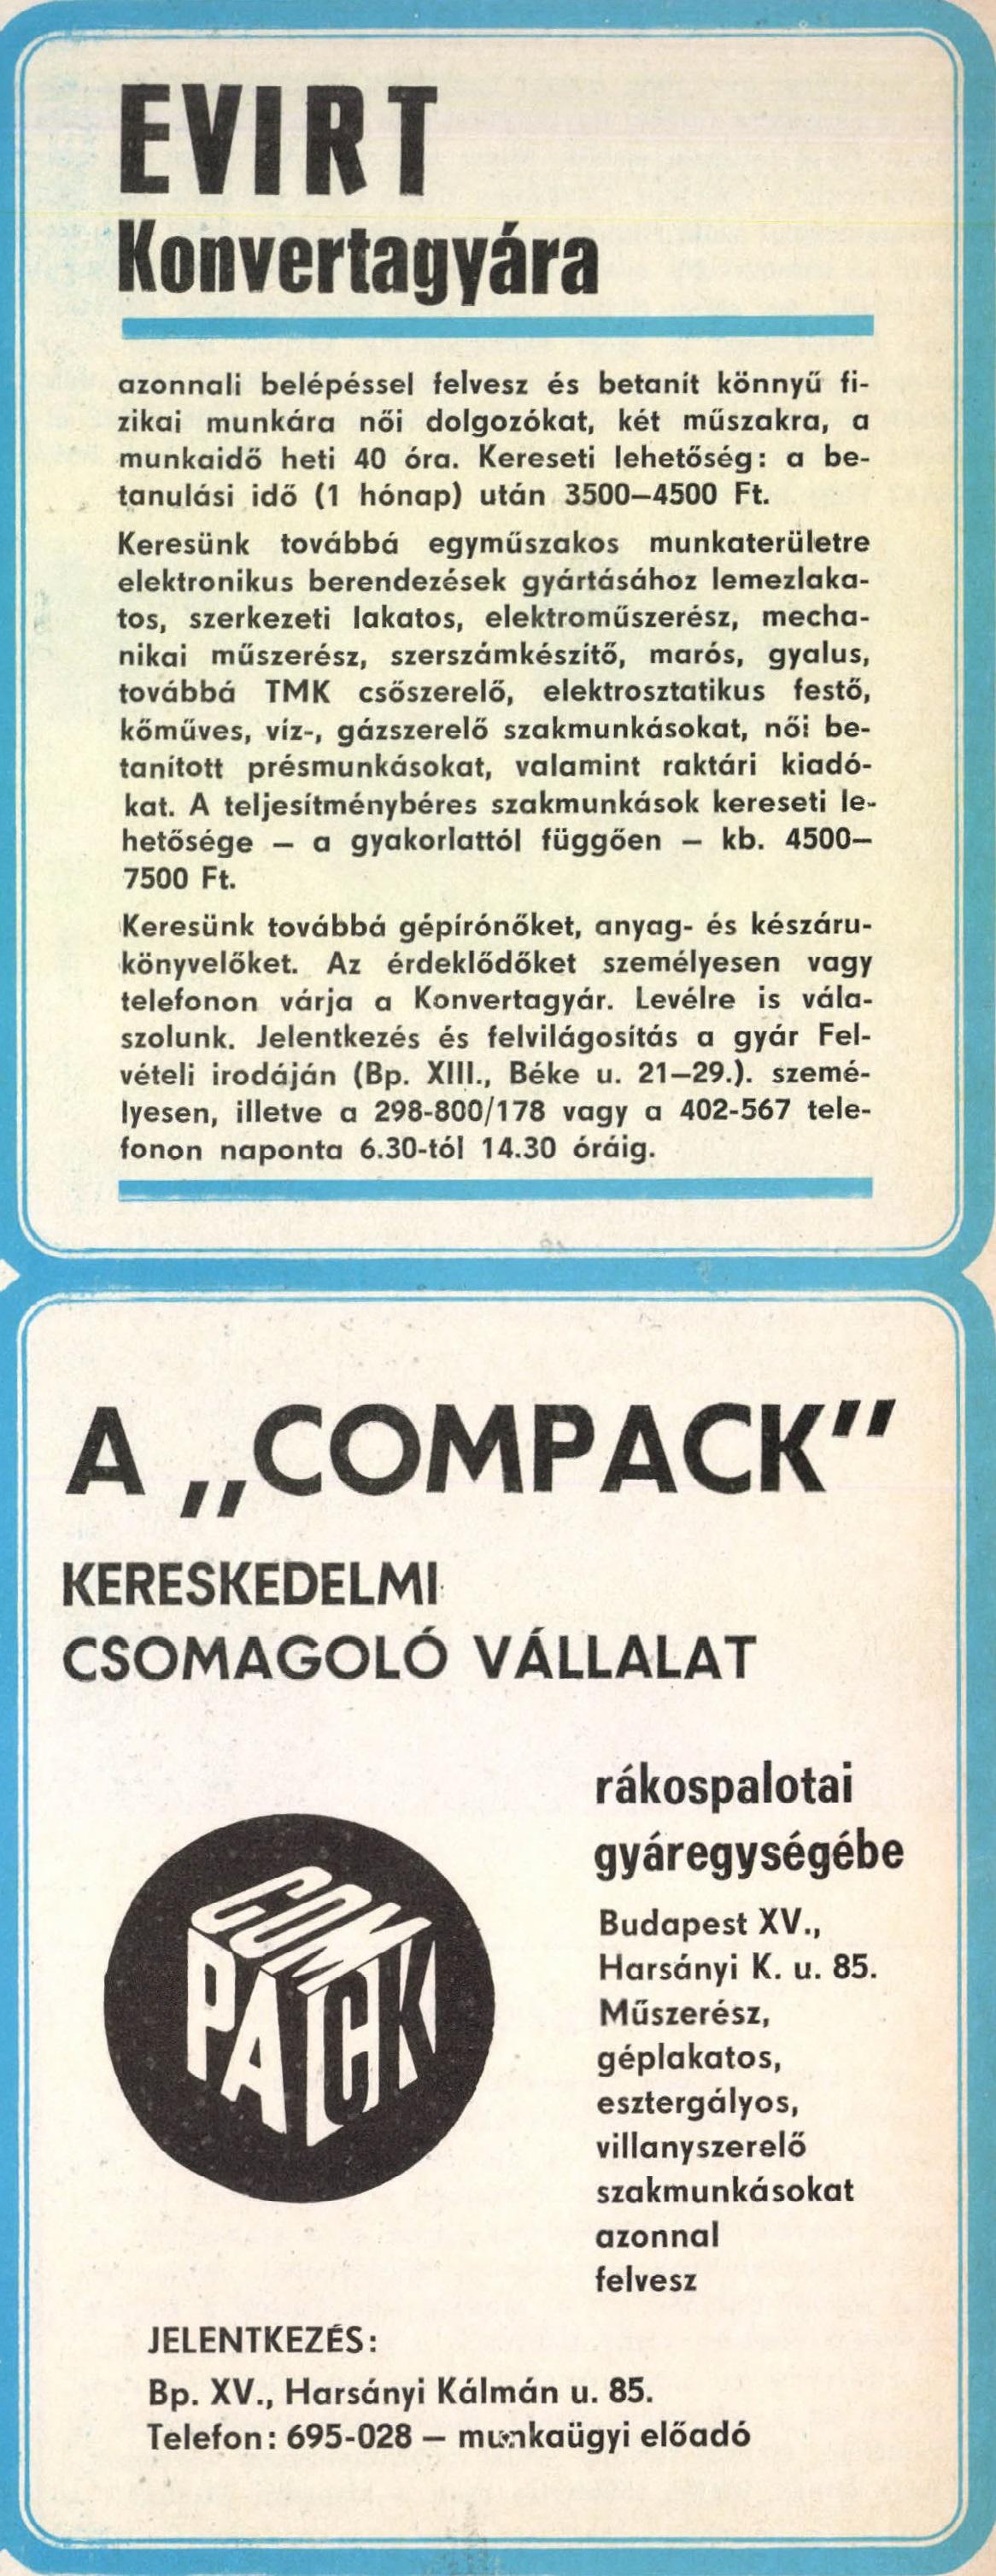 idokapszula_nb_i_1983_84_klubcsapataink_nemzetkozi_kupaszereplese_2_fordulo_1_kor_allasajanlat.jpg